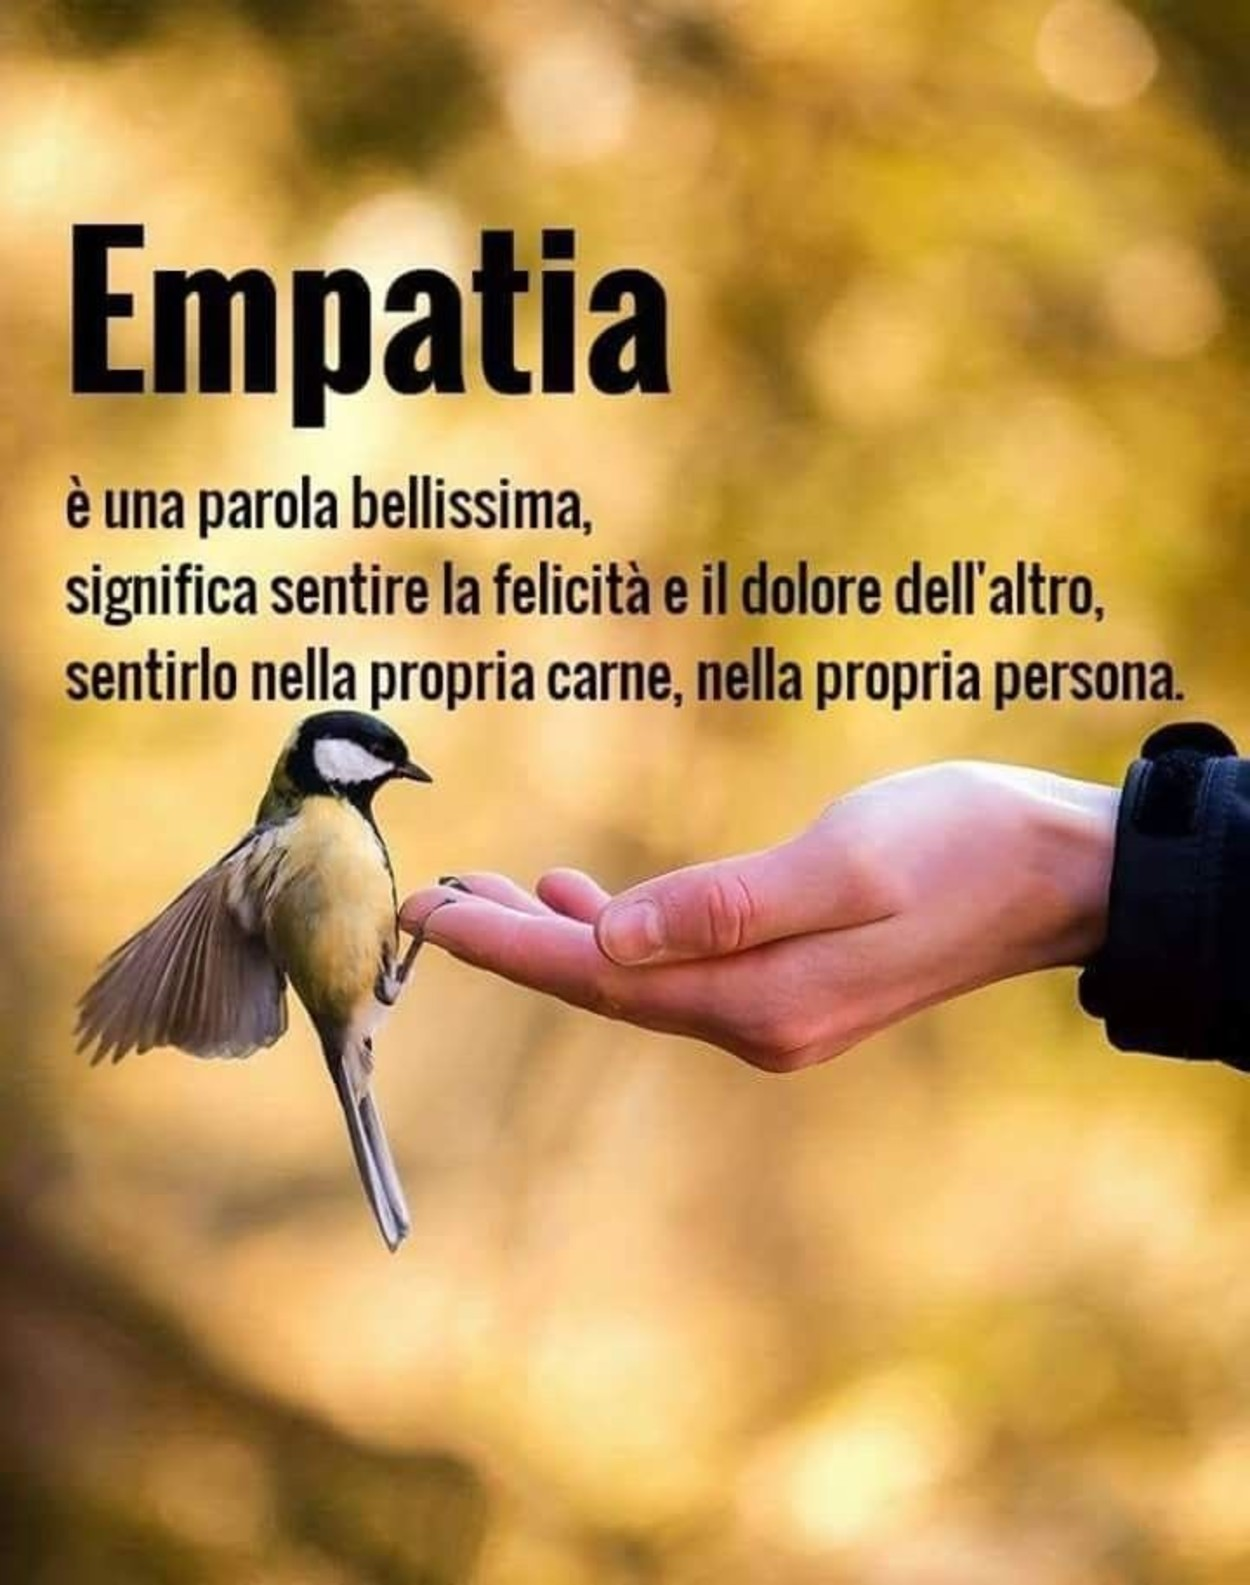 Citazioni Sull Empatia Immaginifacebook It